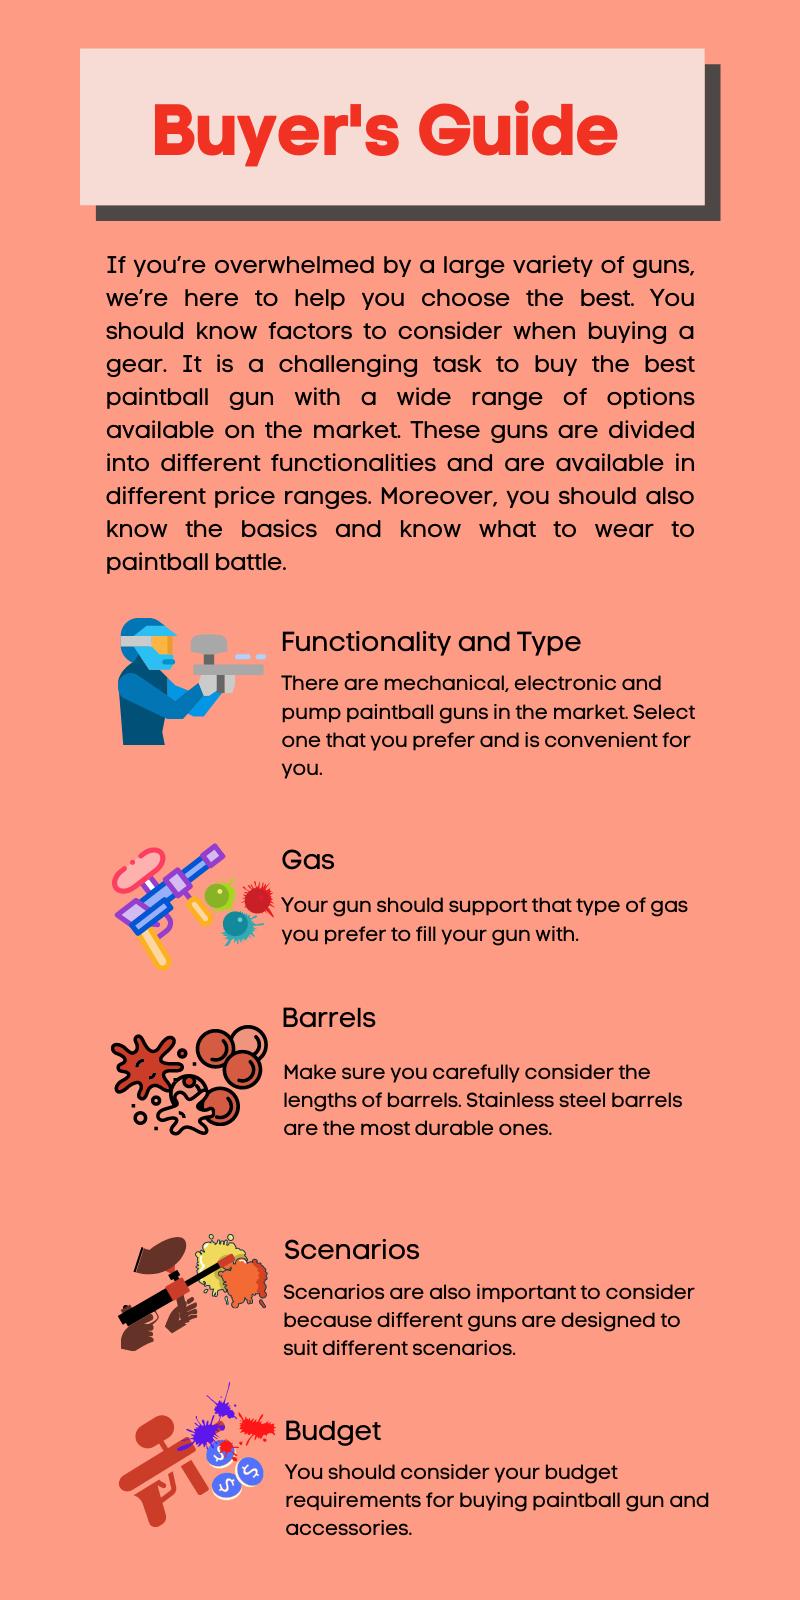 Best Paintball Gun Under 150 Buyer's Guide